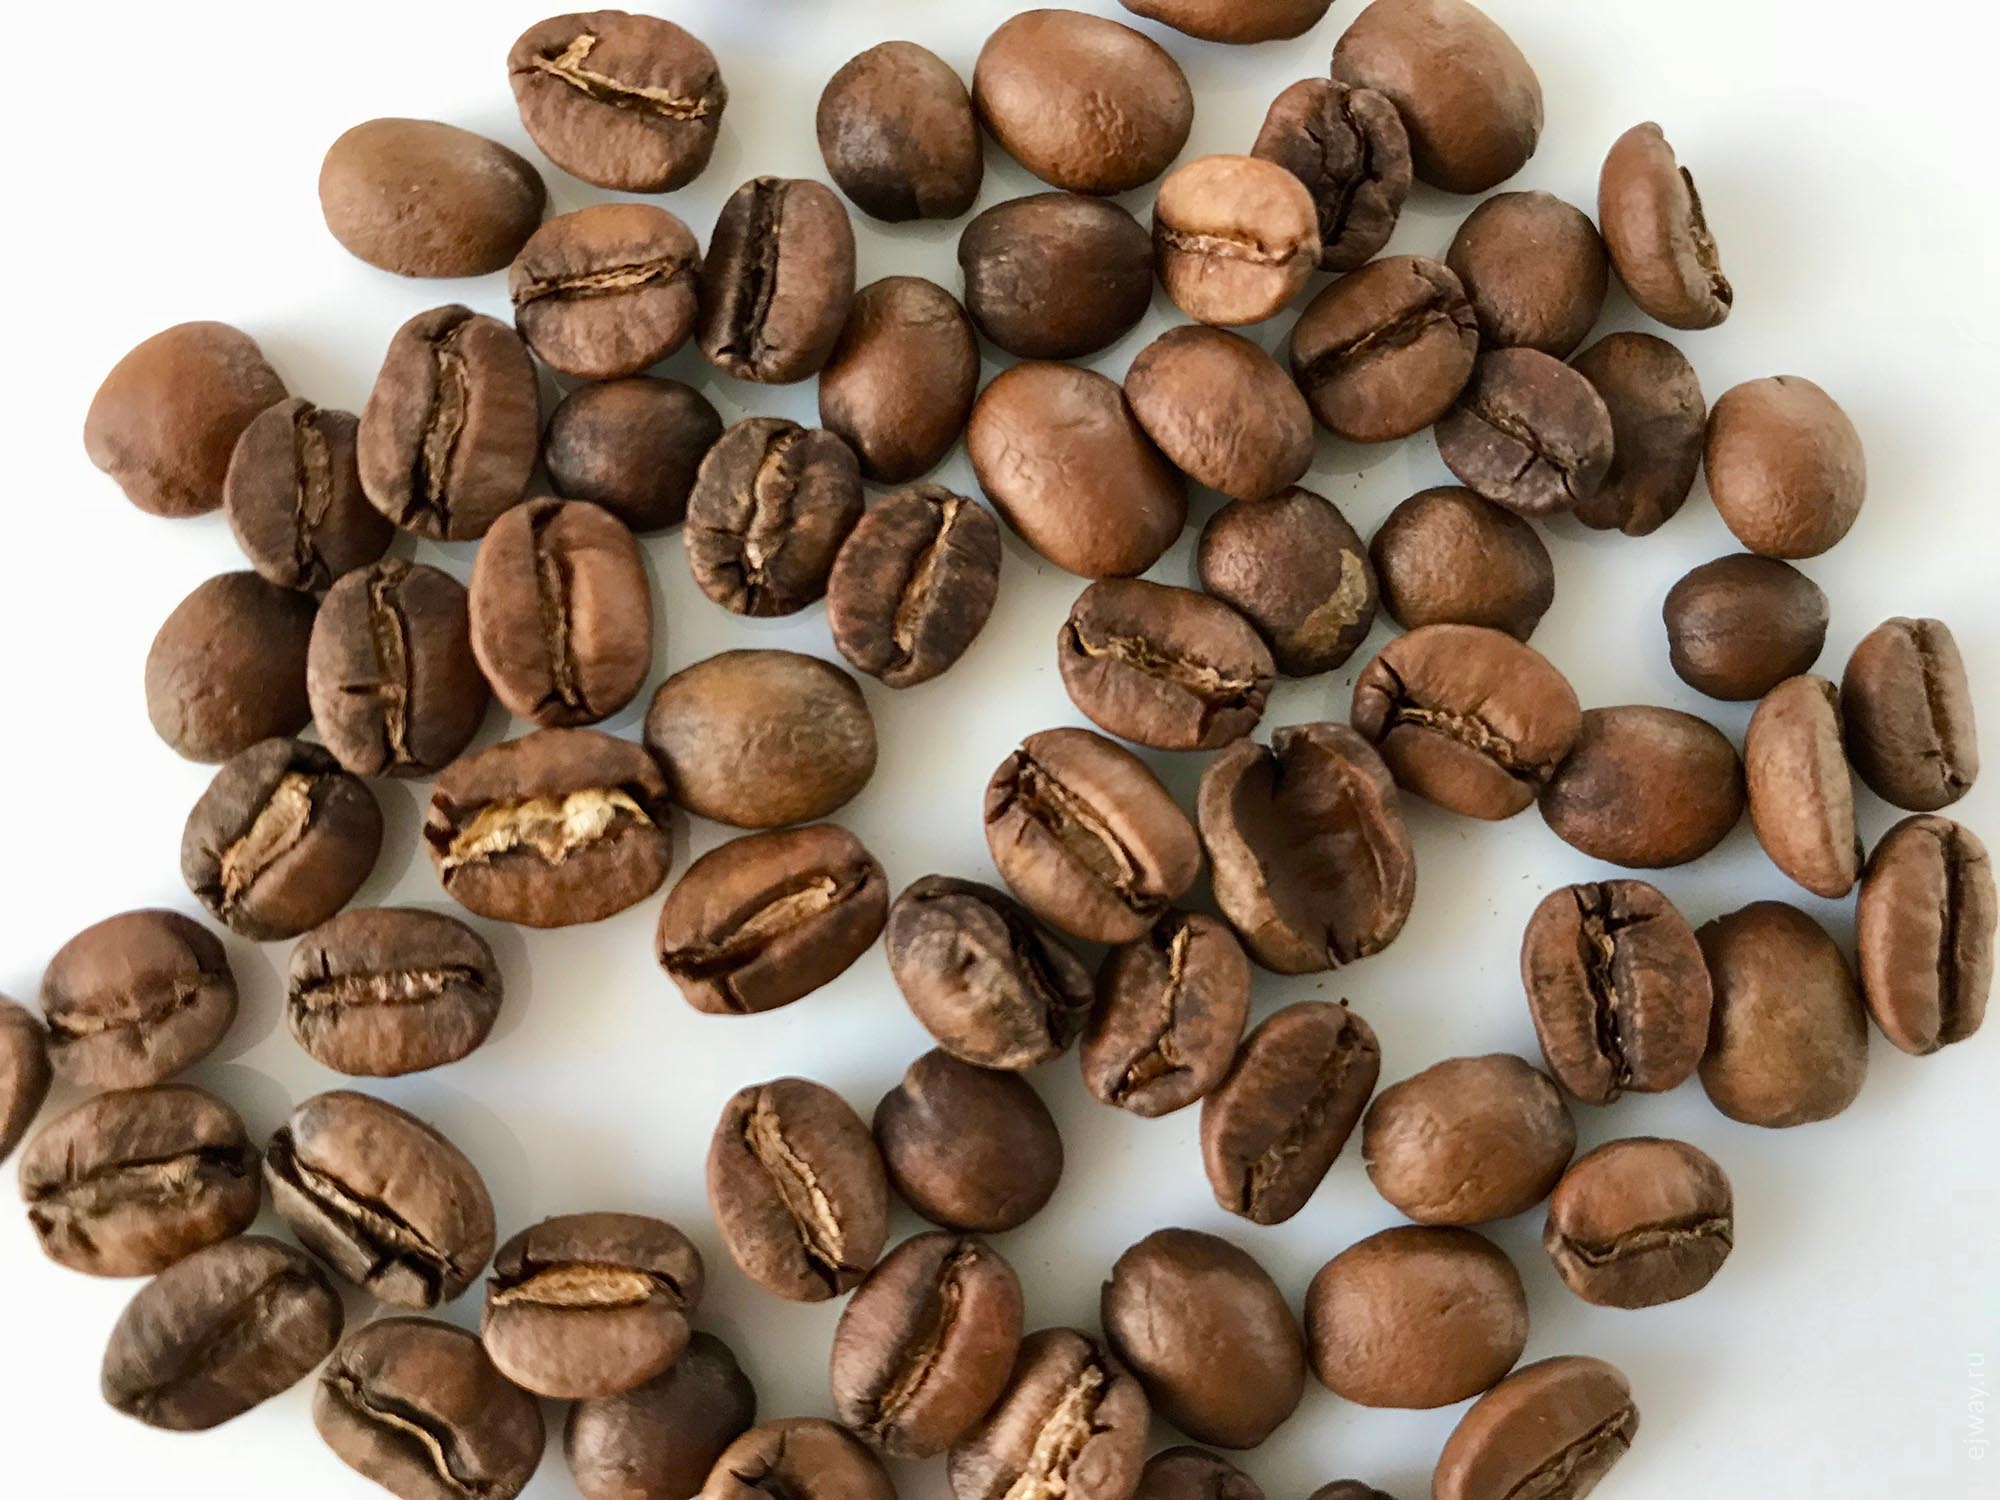 Москва, кофе Шоколадница, ejway.ru, кофе, зерна, шоколаднциа, упаковка, кофе в зернах на 4